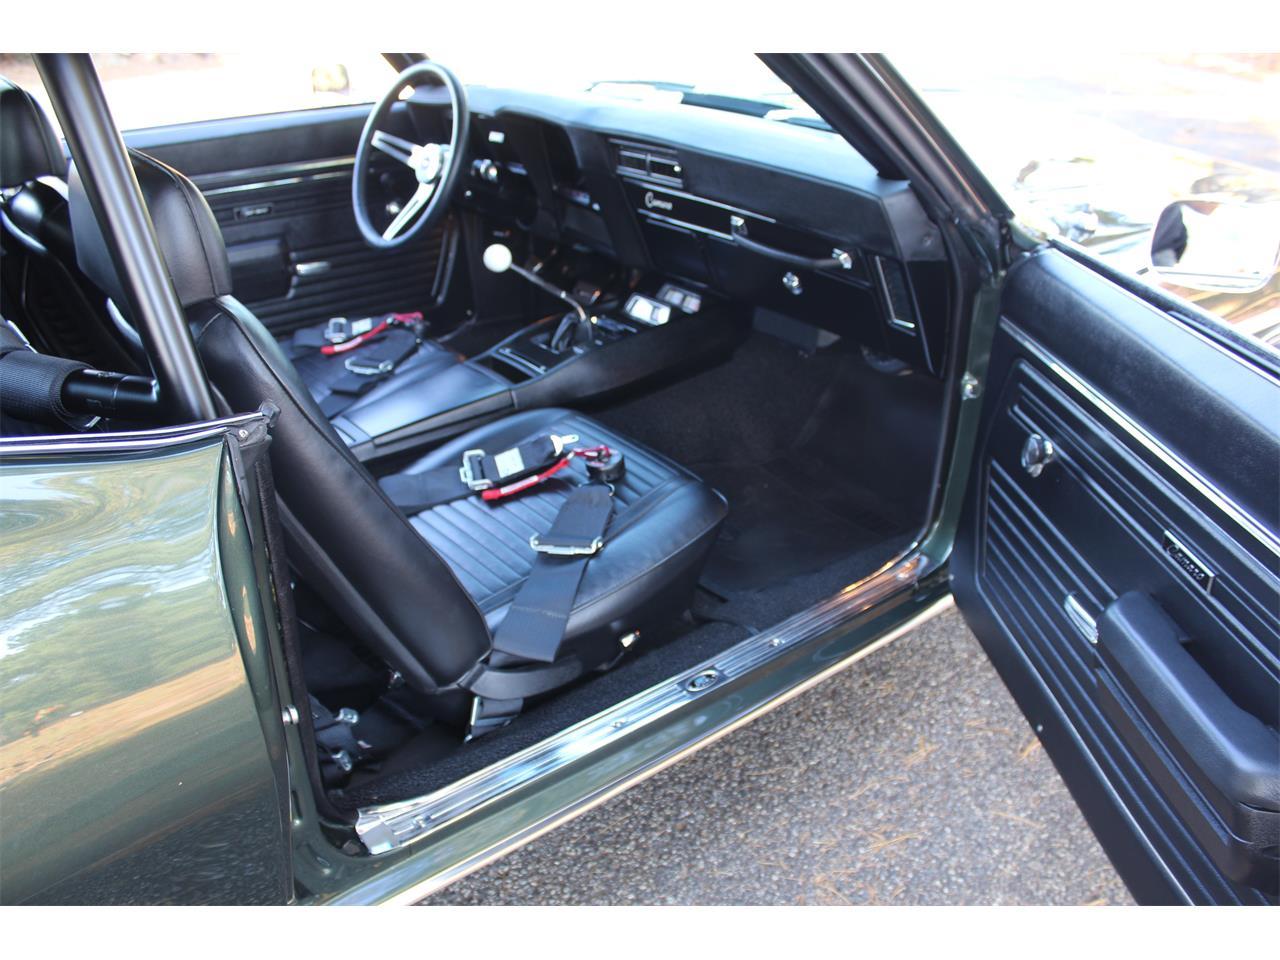 1969 Chevrolet Camaro (CC-1298577) for sale in Roswell, Georgia